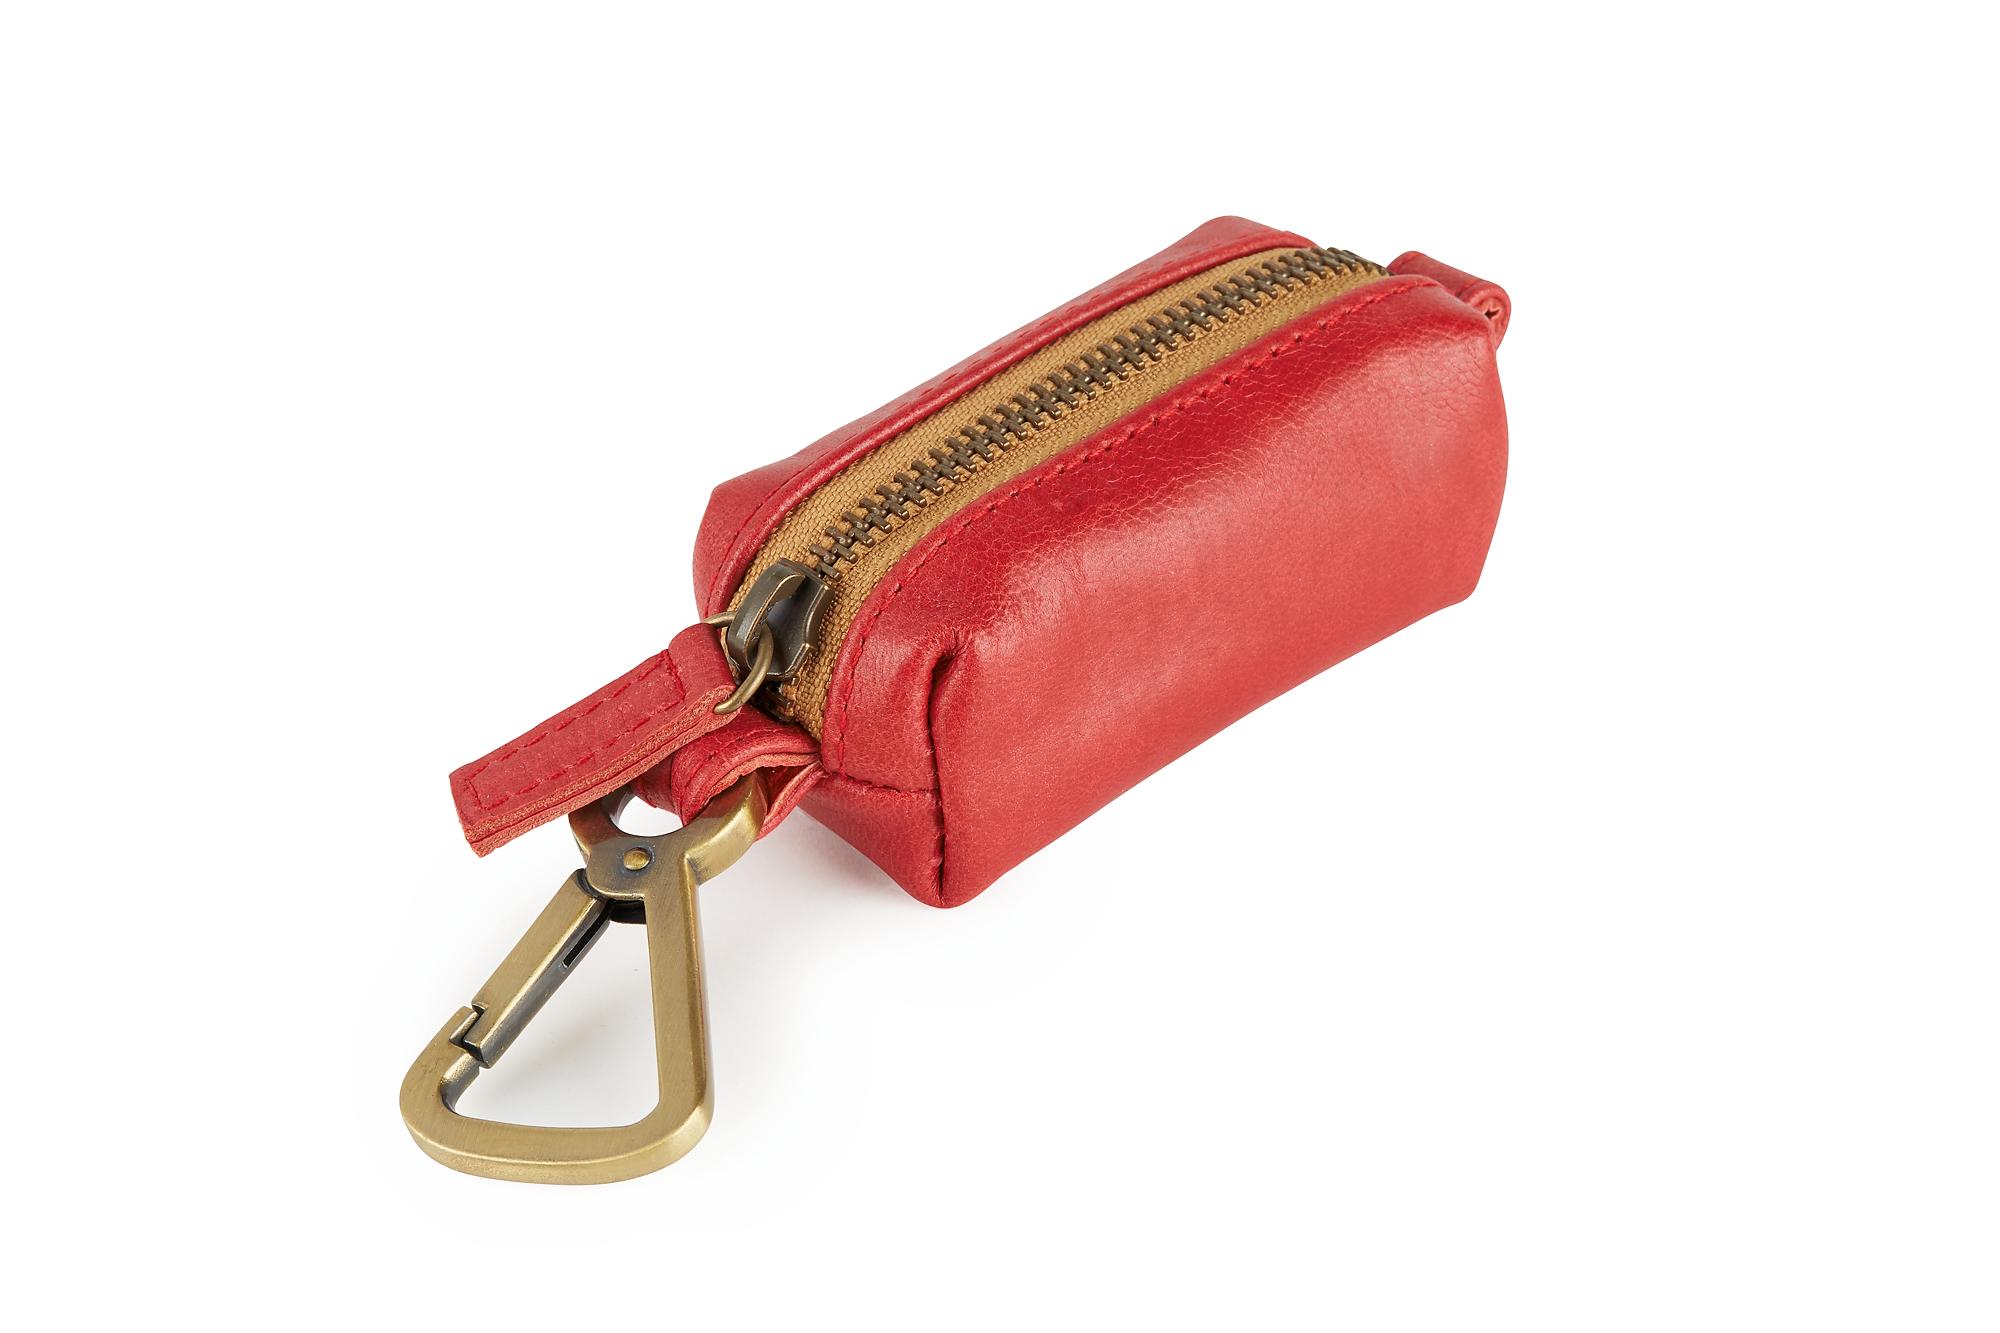 Coronado Pocket Pooper - Top View